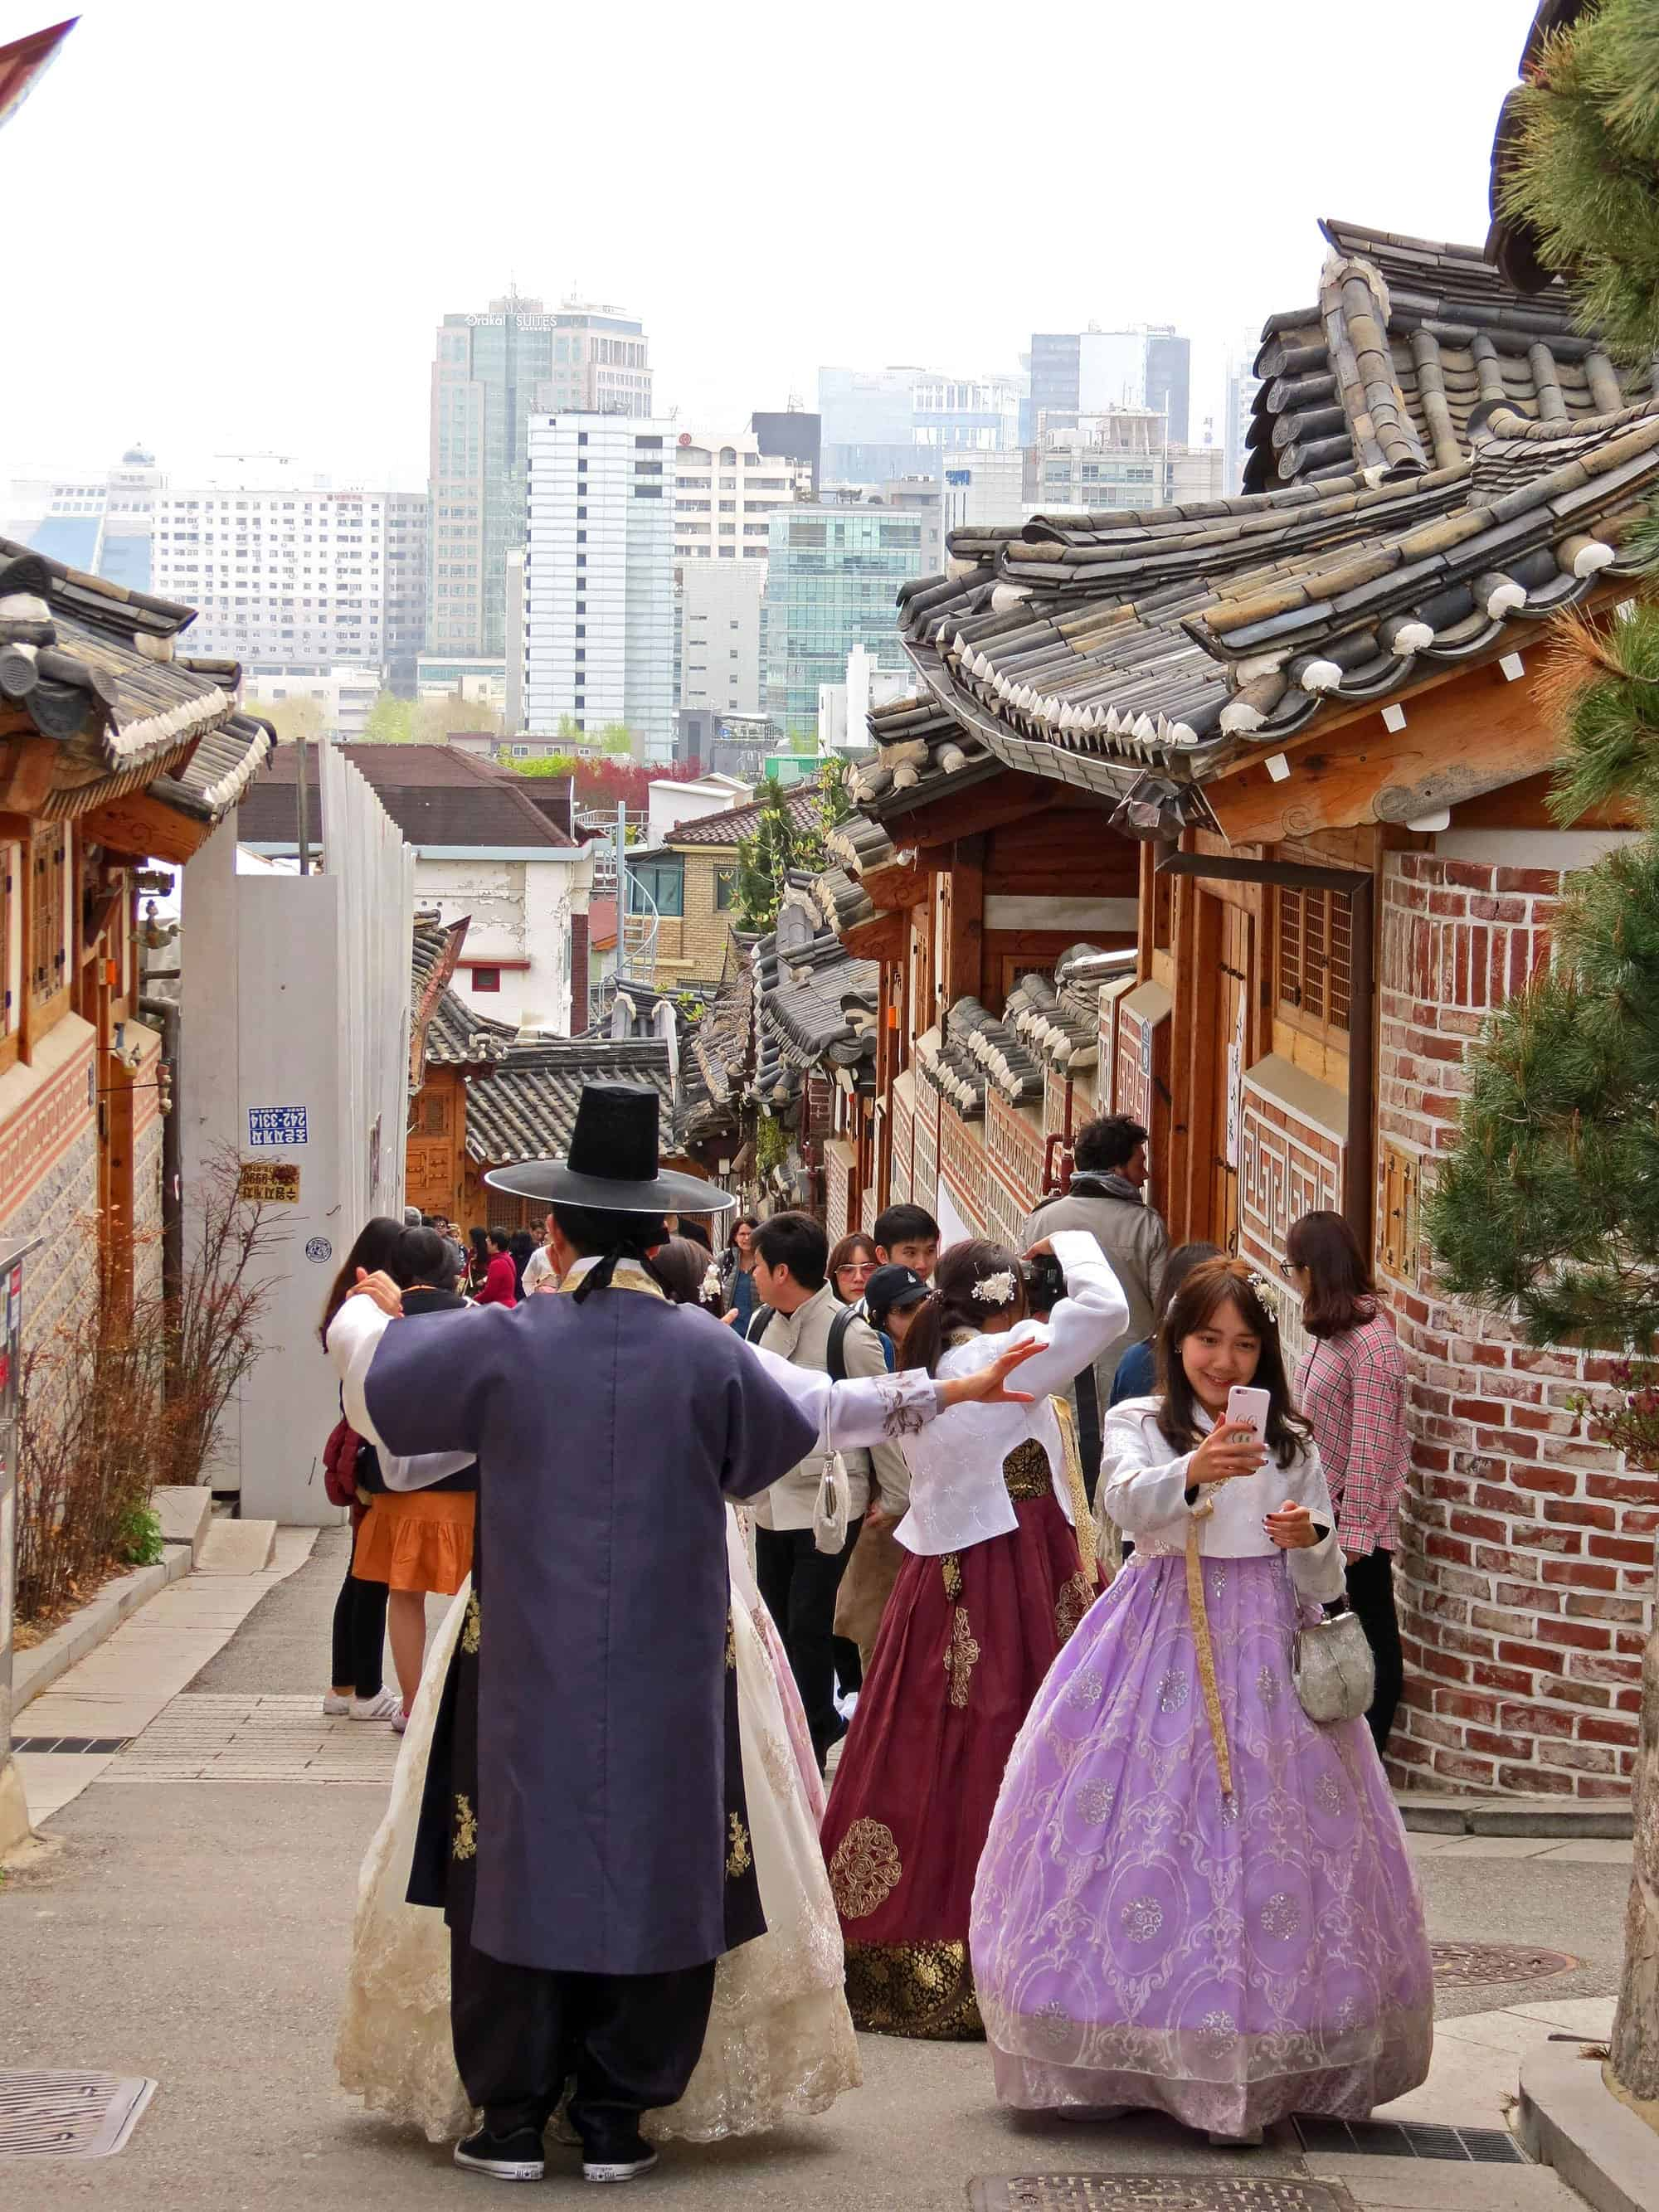 Seoul, Bukchon Hanok Village, South Korea